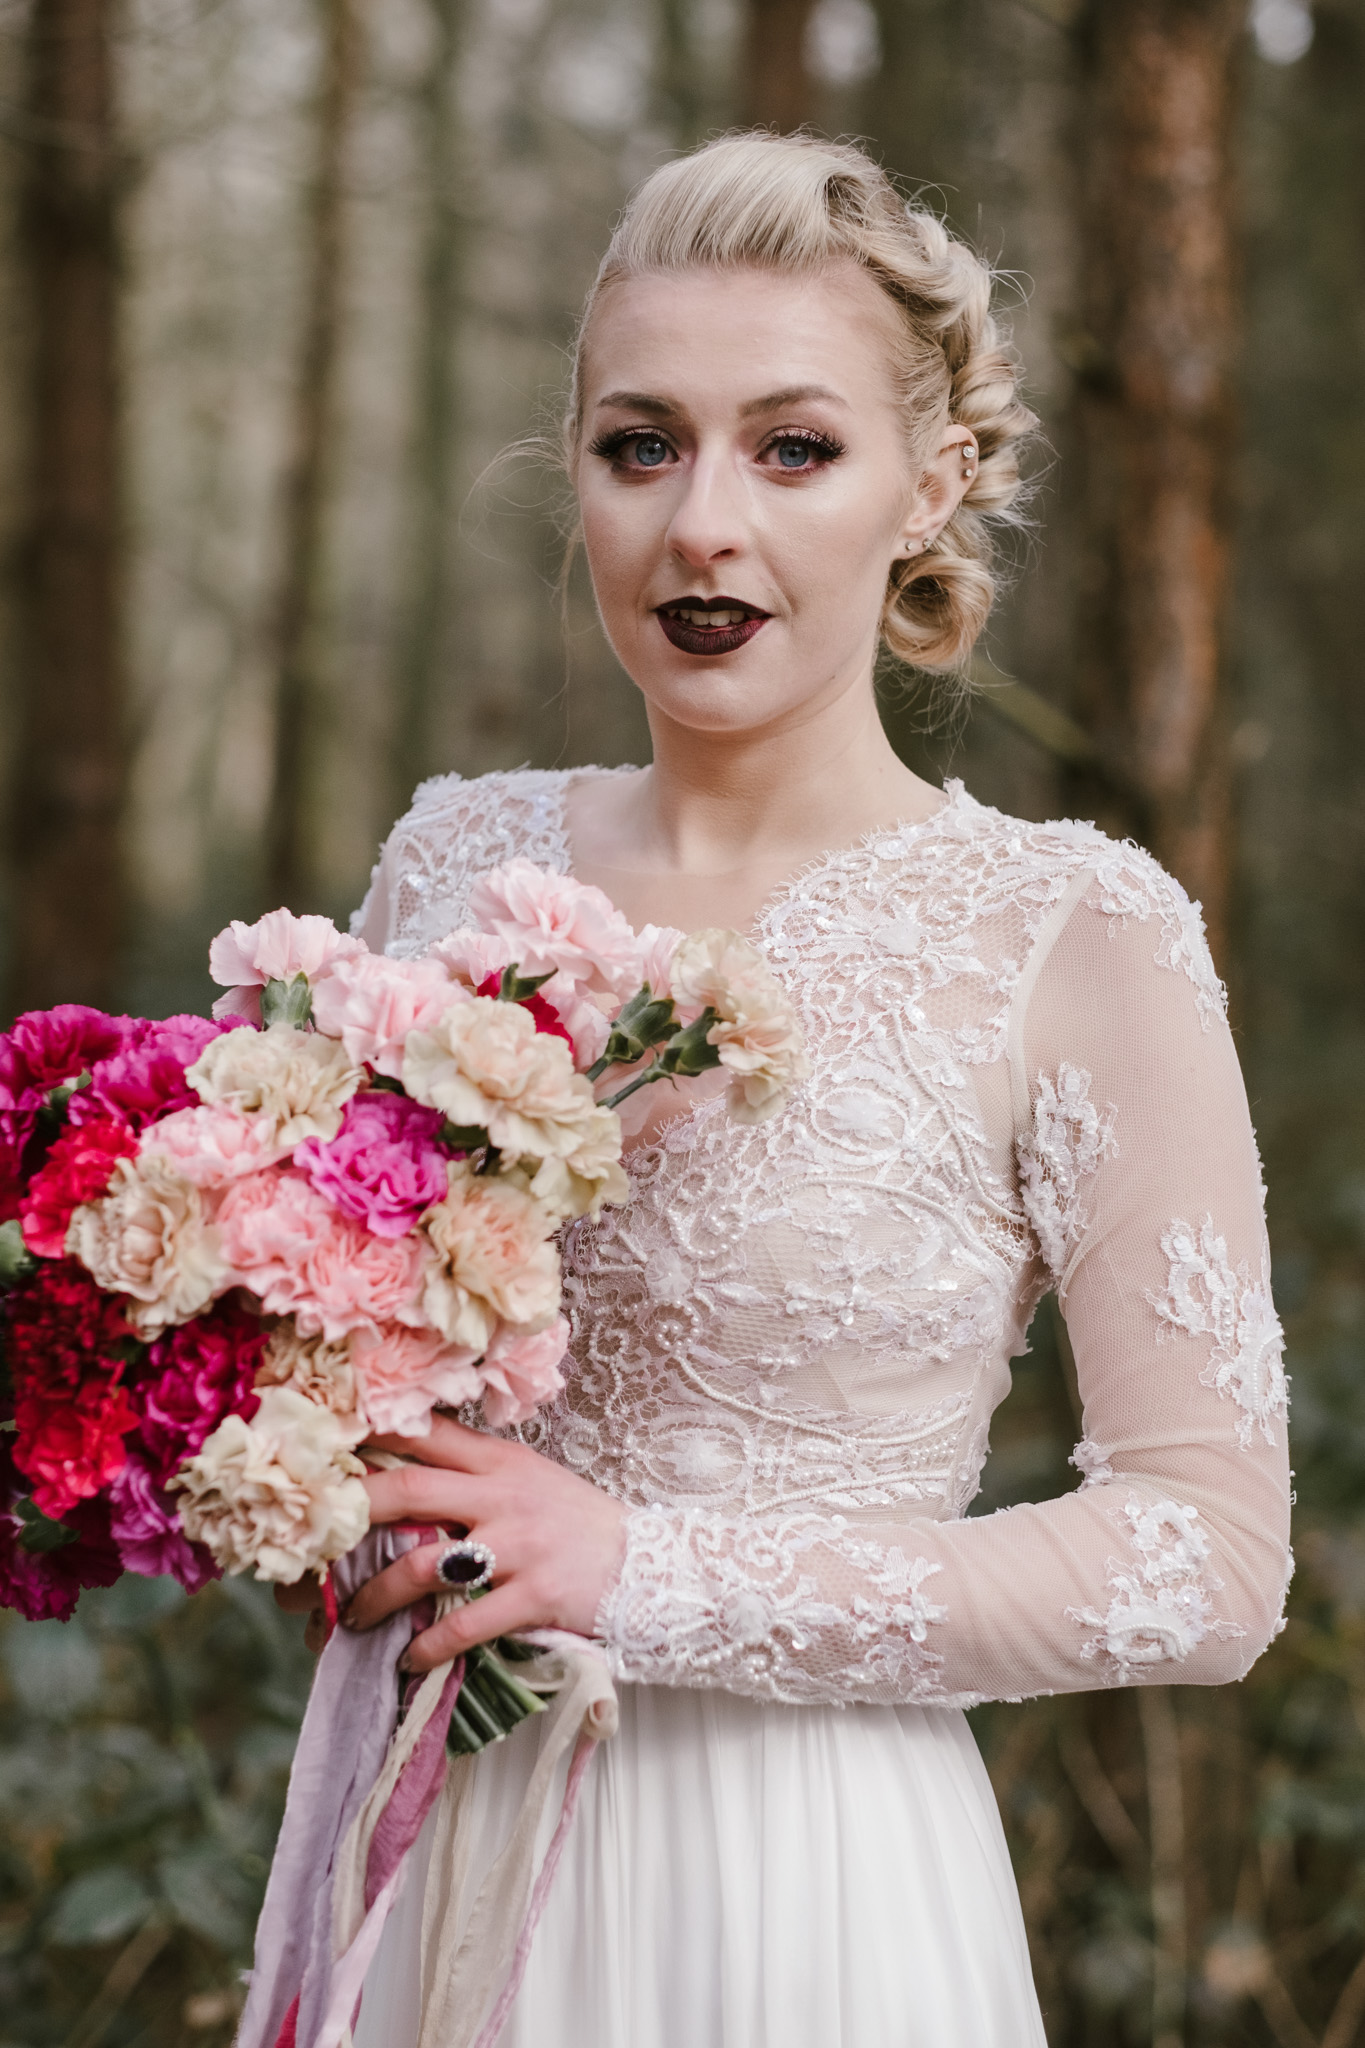 Captains-Wood-Barn-Alterative-Rustic-Vintage-Essex-Wedding-Suffolk-Grace-Elizabeth-20.jpg